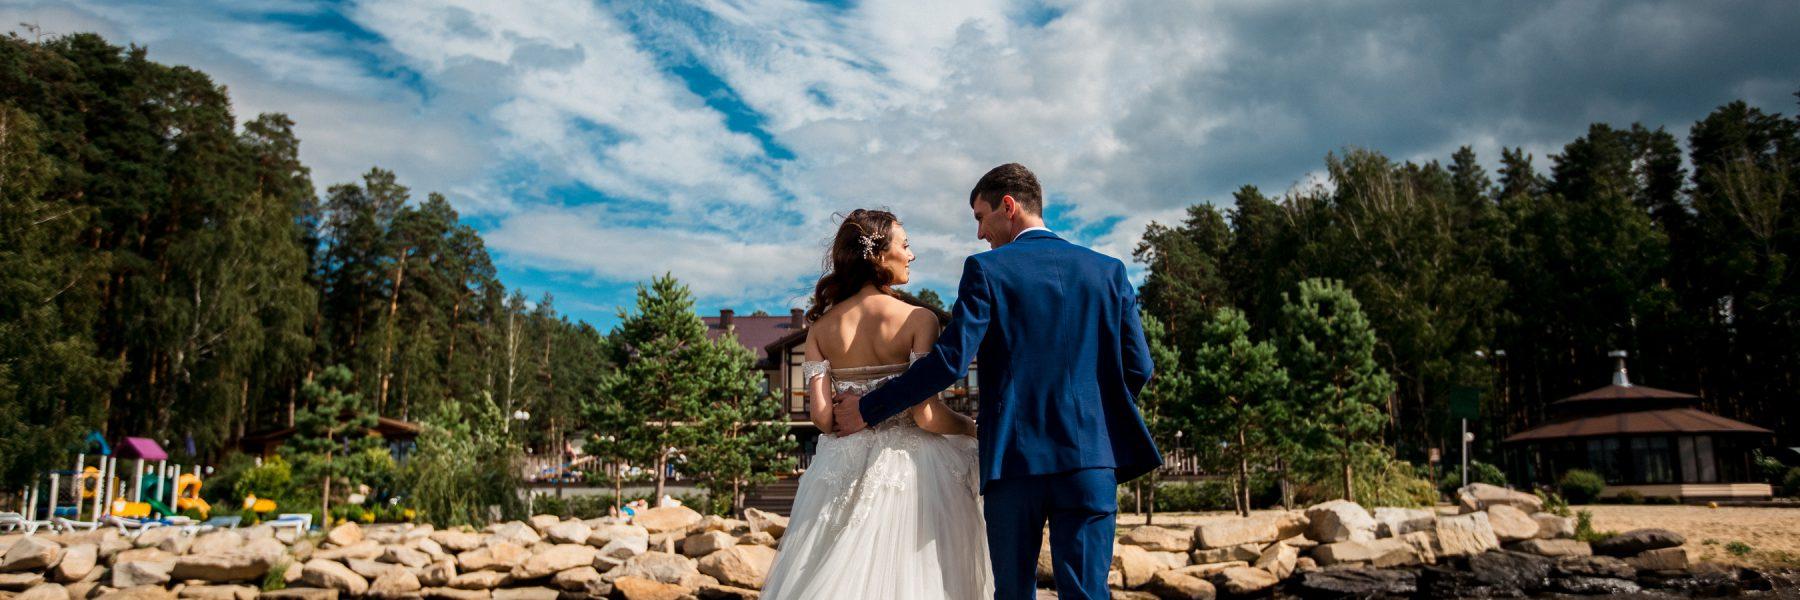 Онлайн-организатор свадьбы